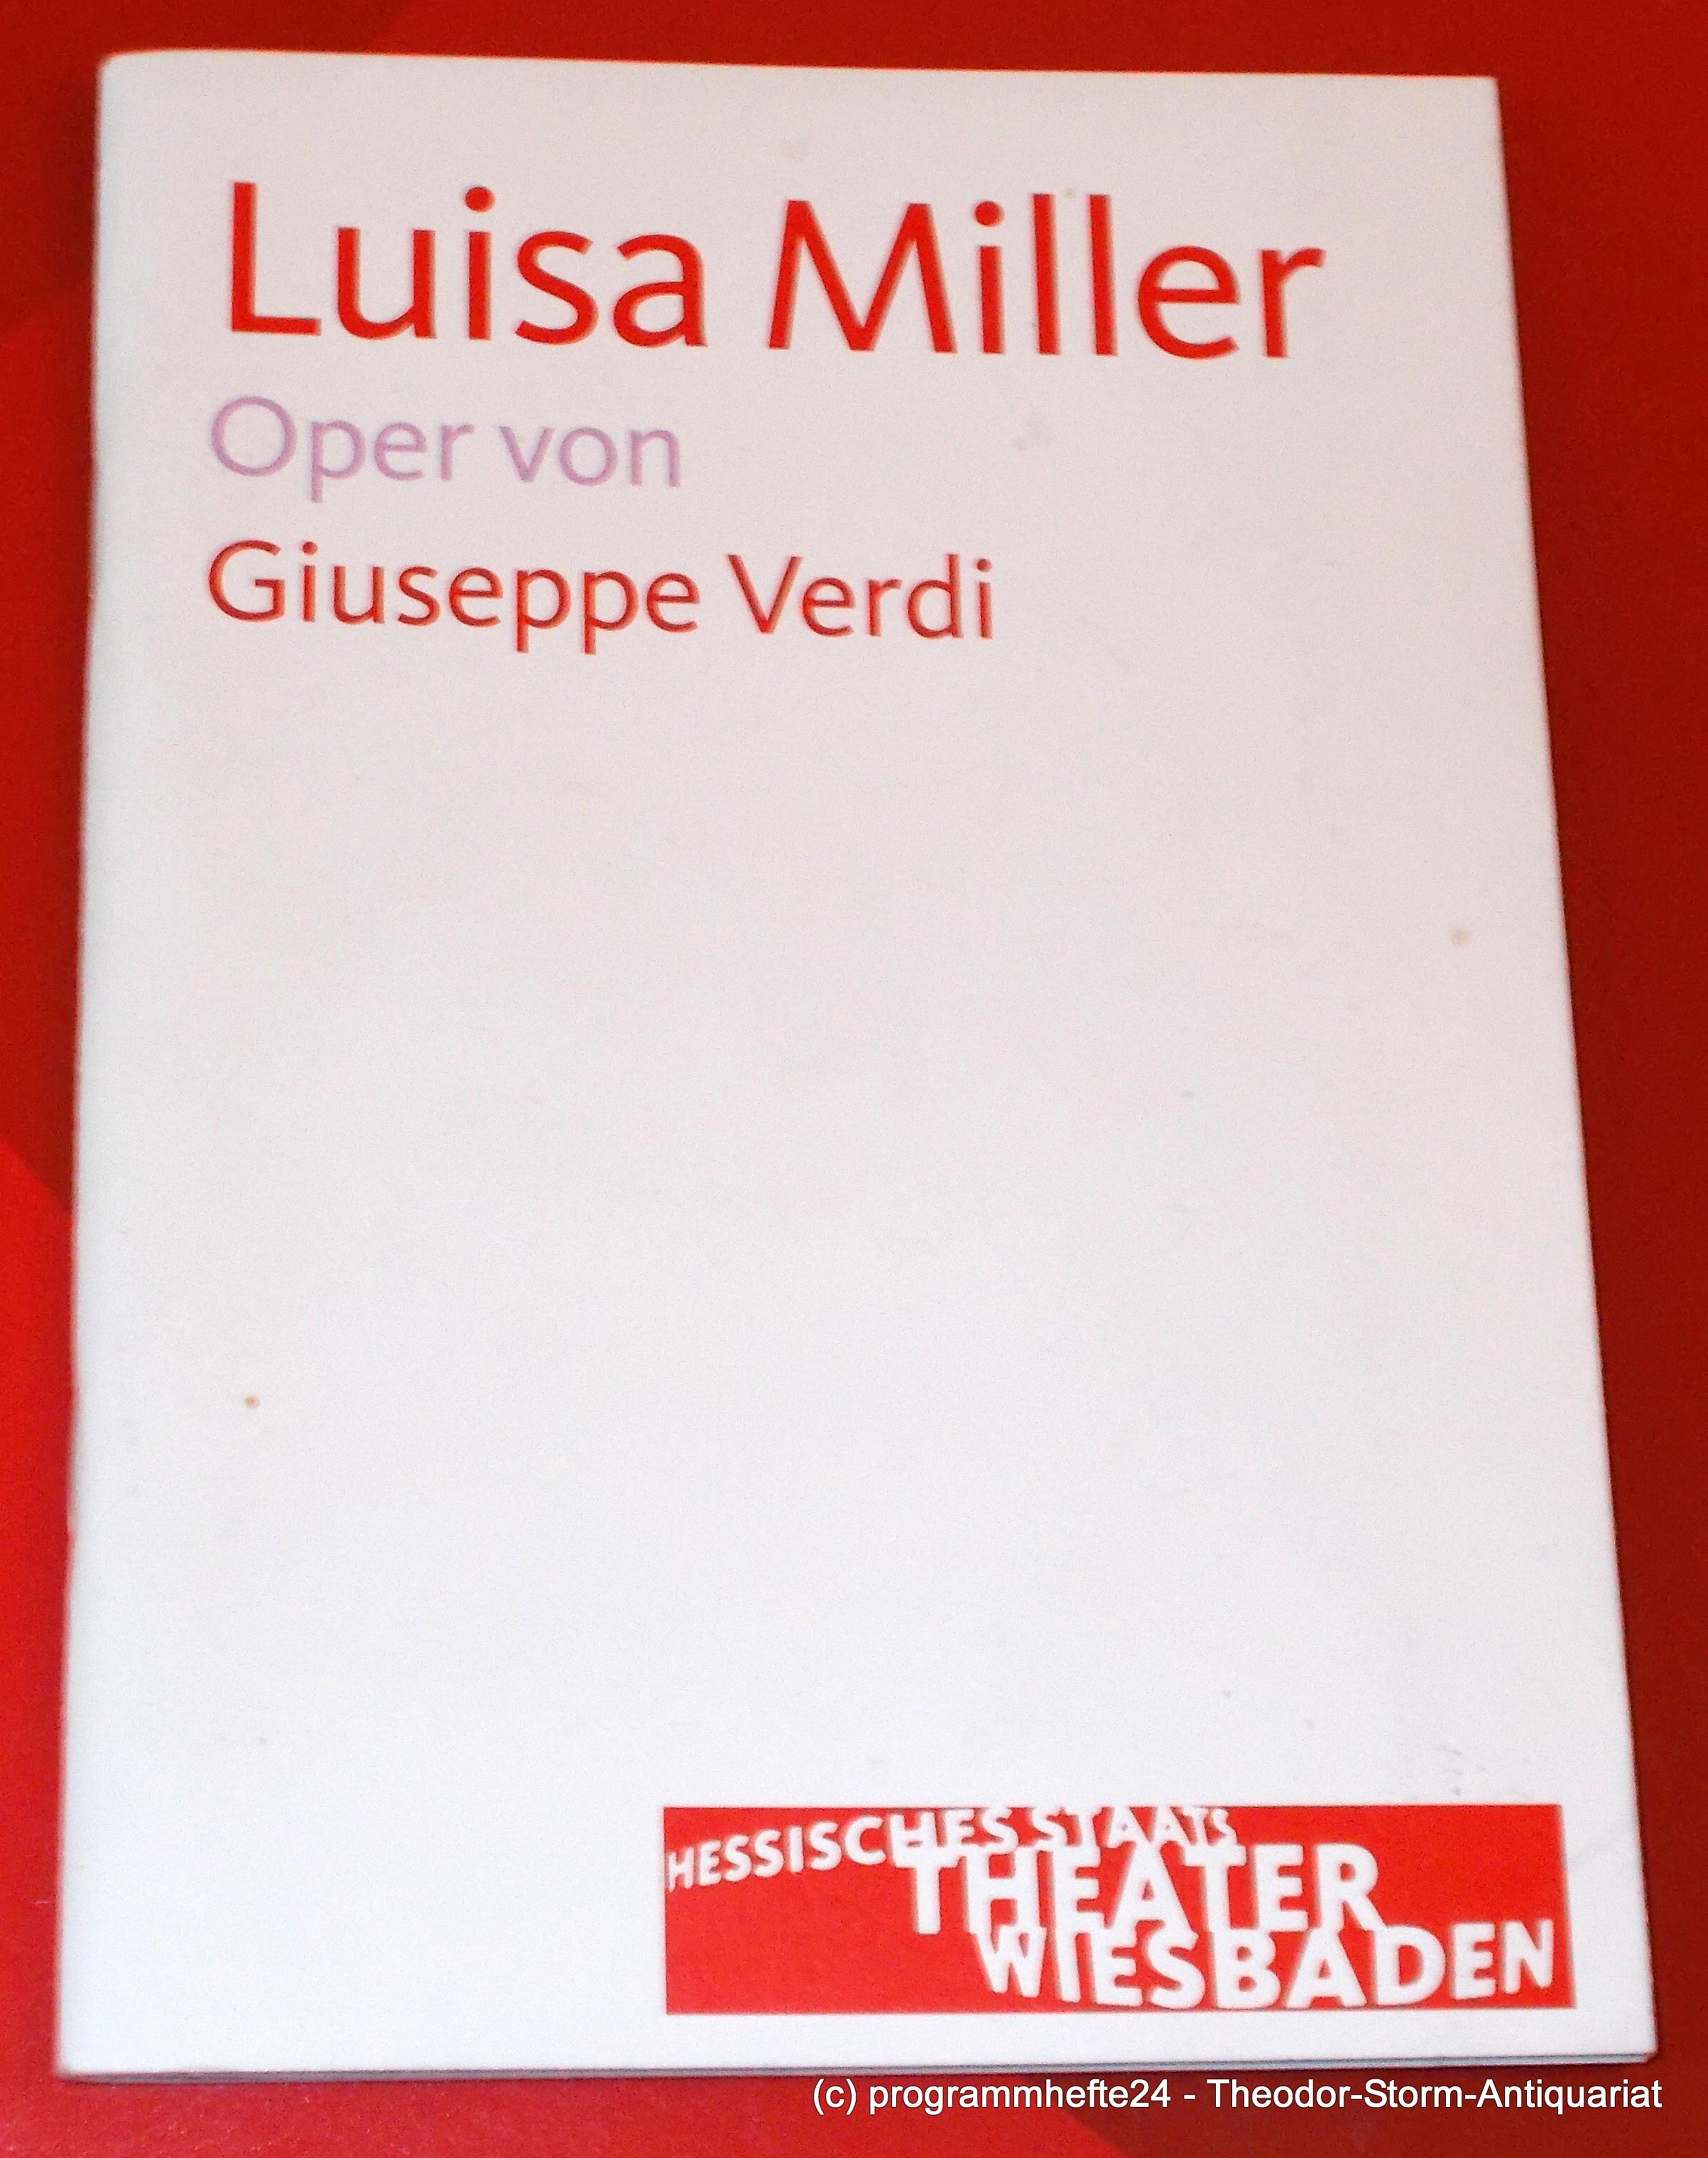 Programmheft LUISA MILLER von Giuseppe Verdi. Staatstheater Wiesbaden 2011